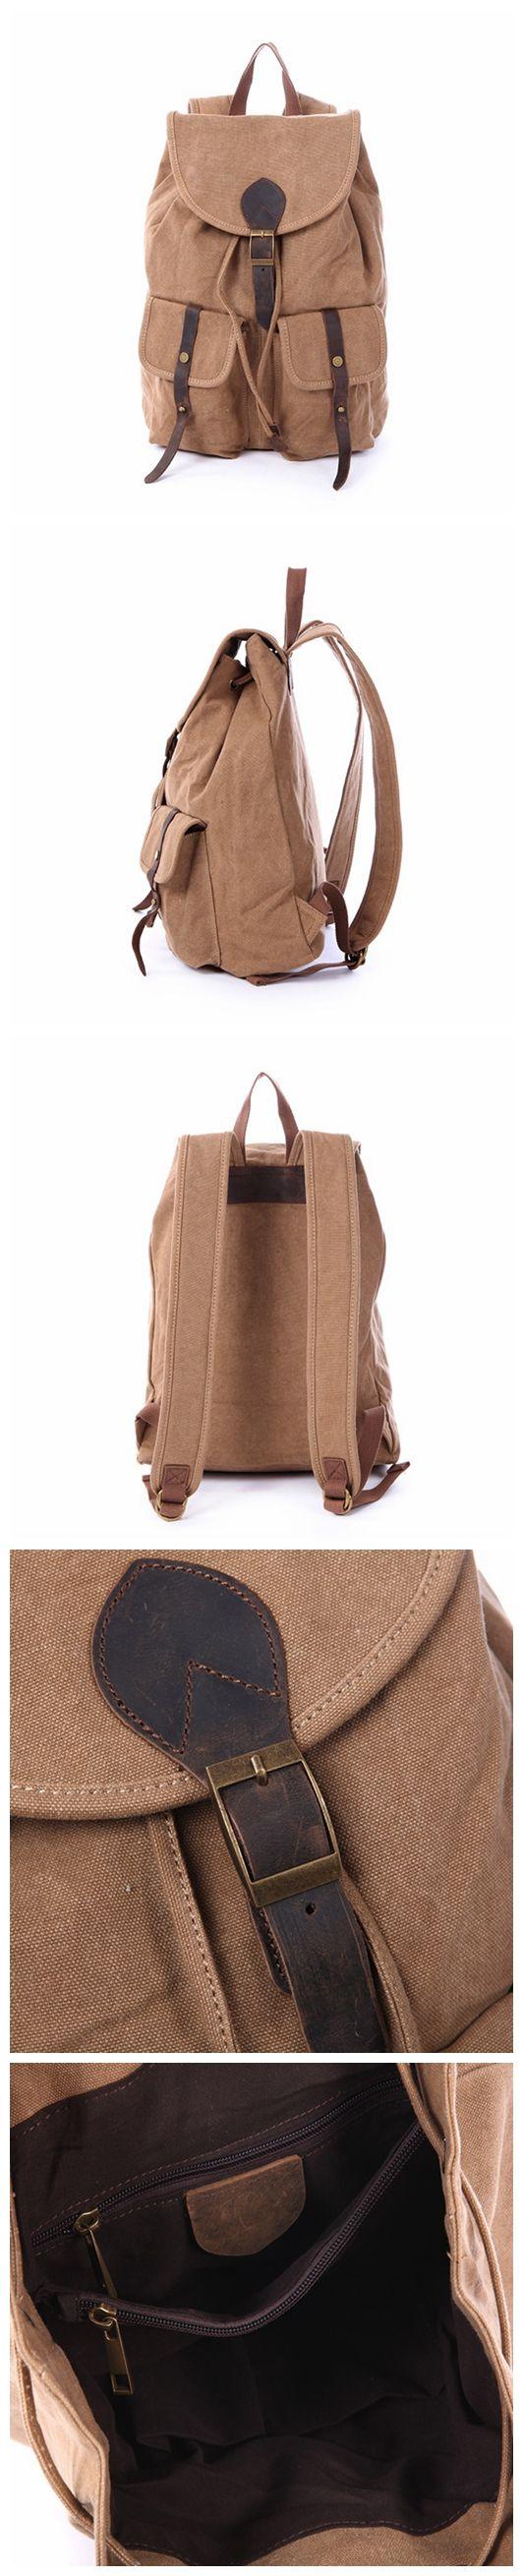 New Vintage Backpack Fashion Canvas Backpack Leisure Travel Bags Unisex Backpacks Men Backpack